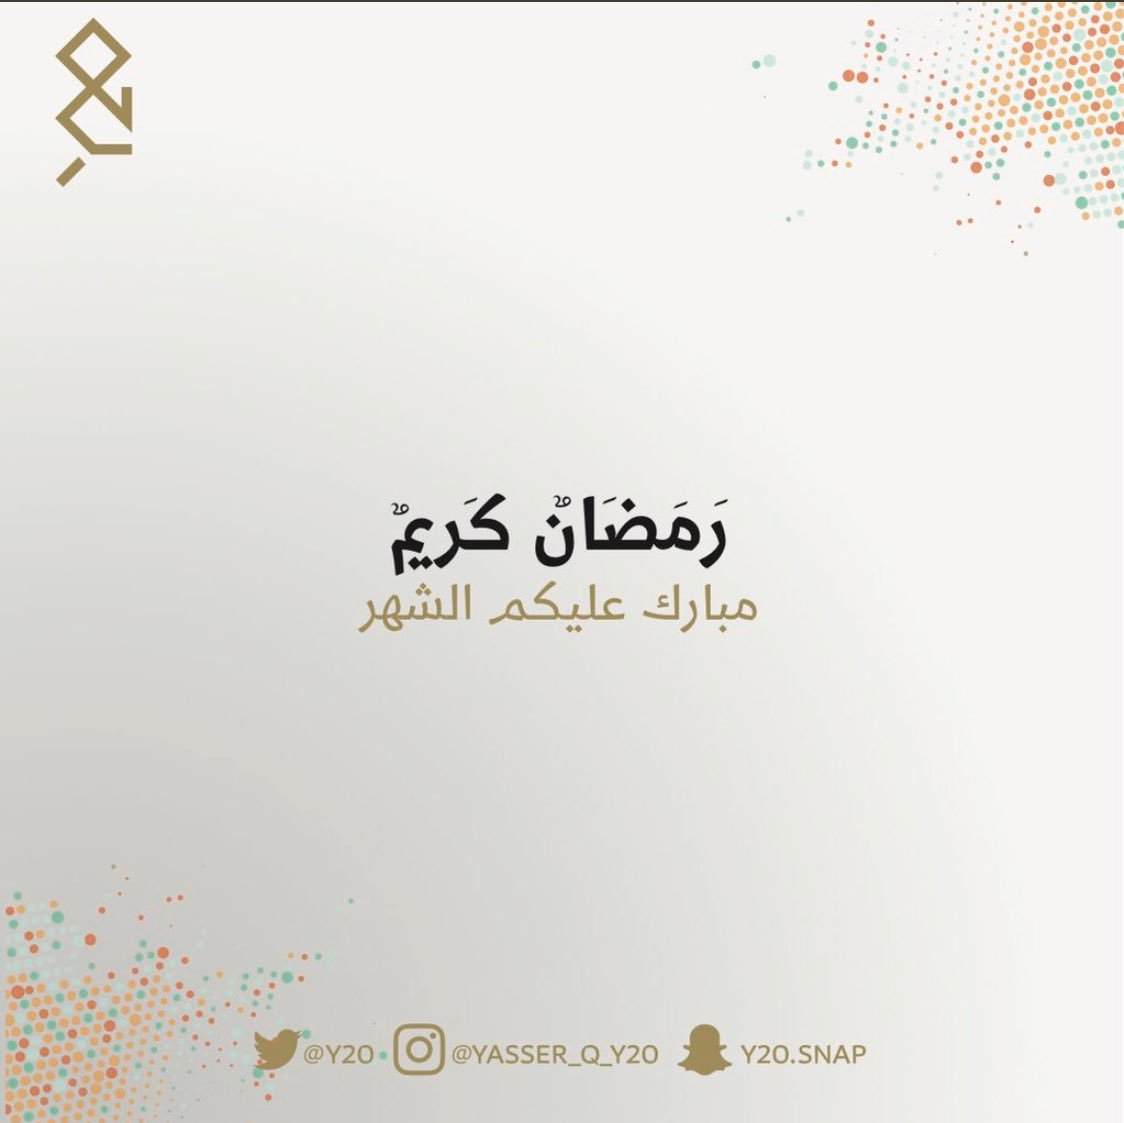 ياسر القحطاني's photo on #رمضان_كريم